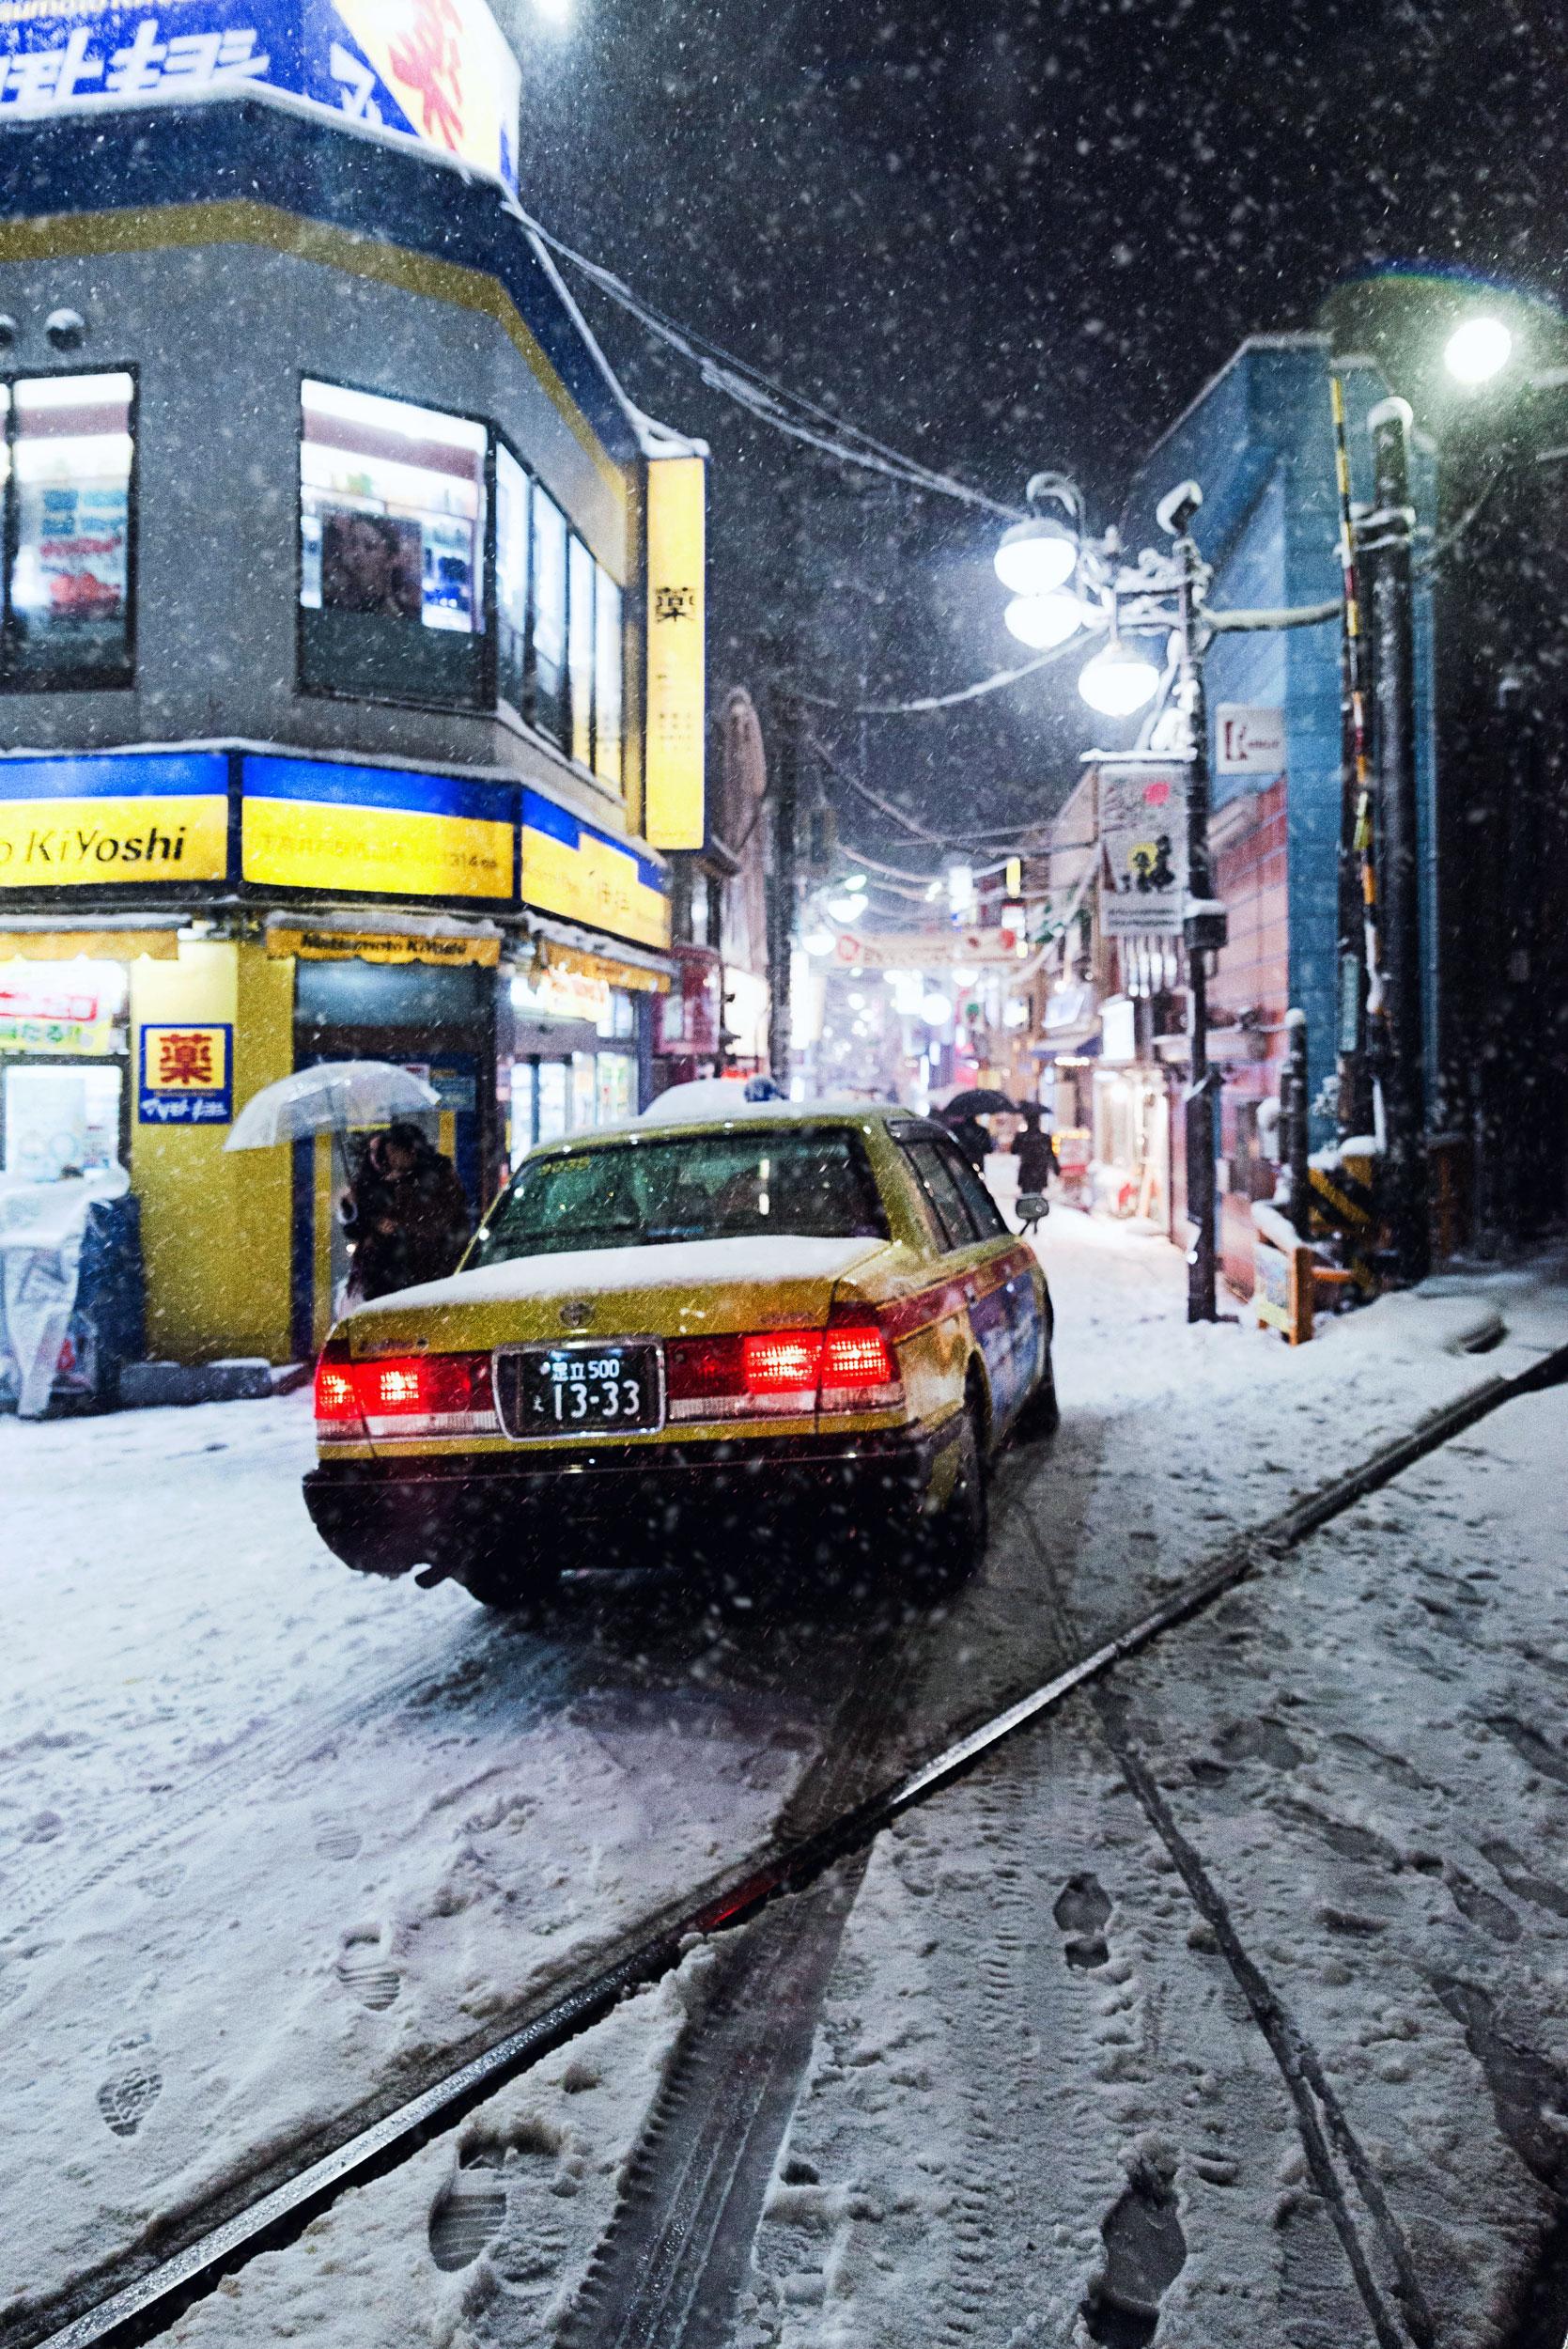 A taxi navigates a narrow street in Setagaya.